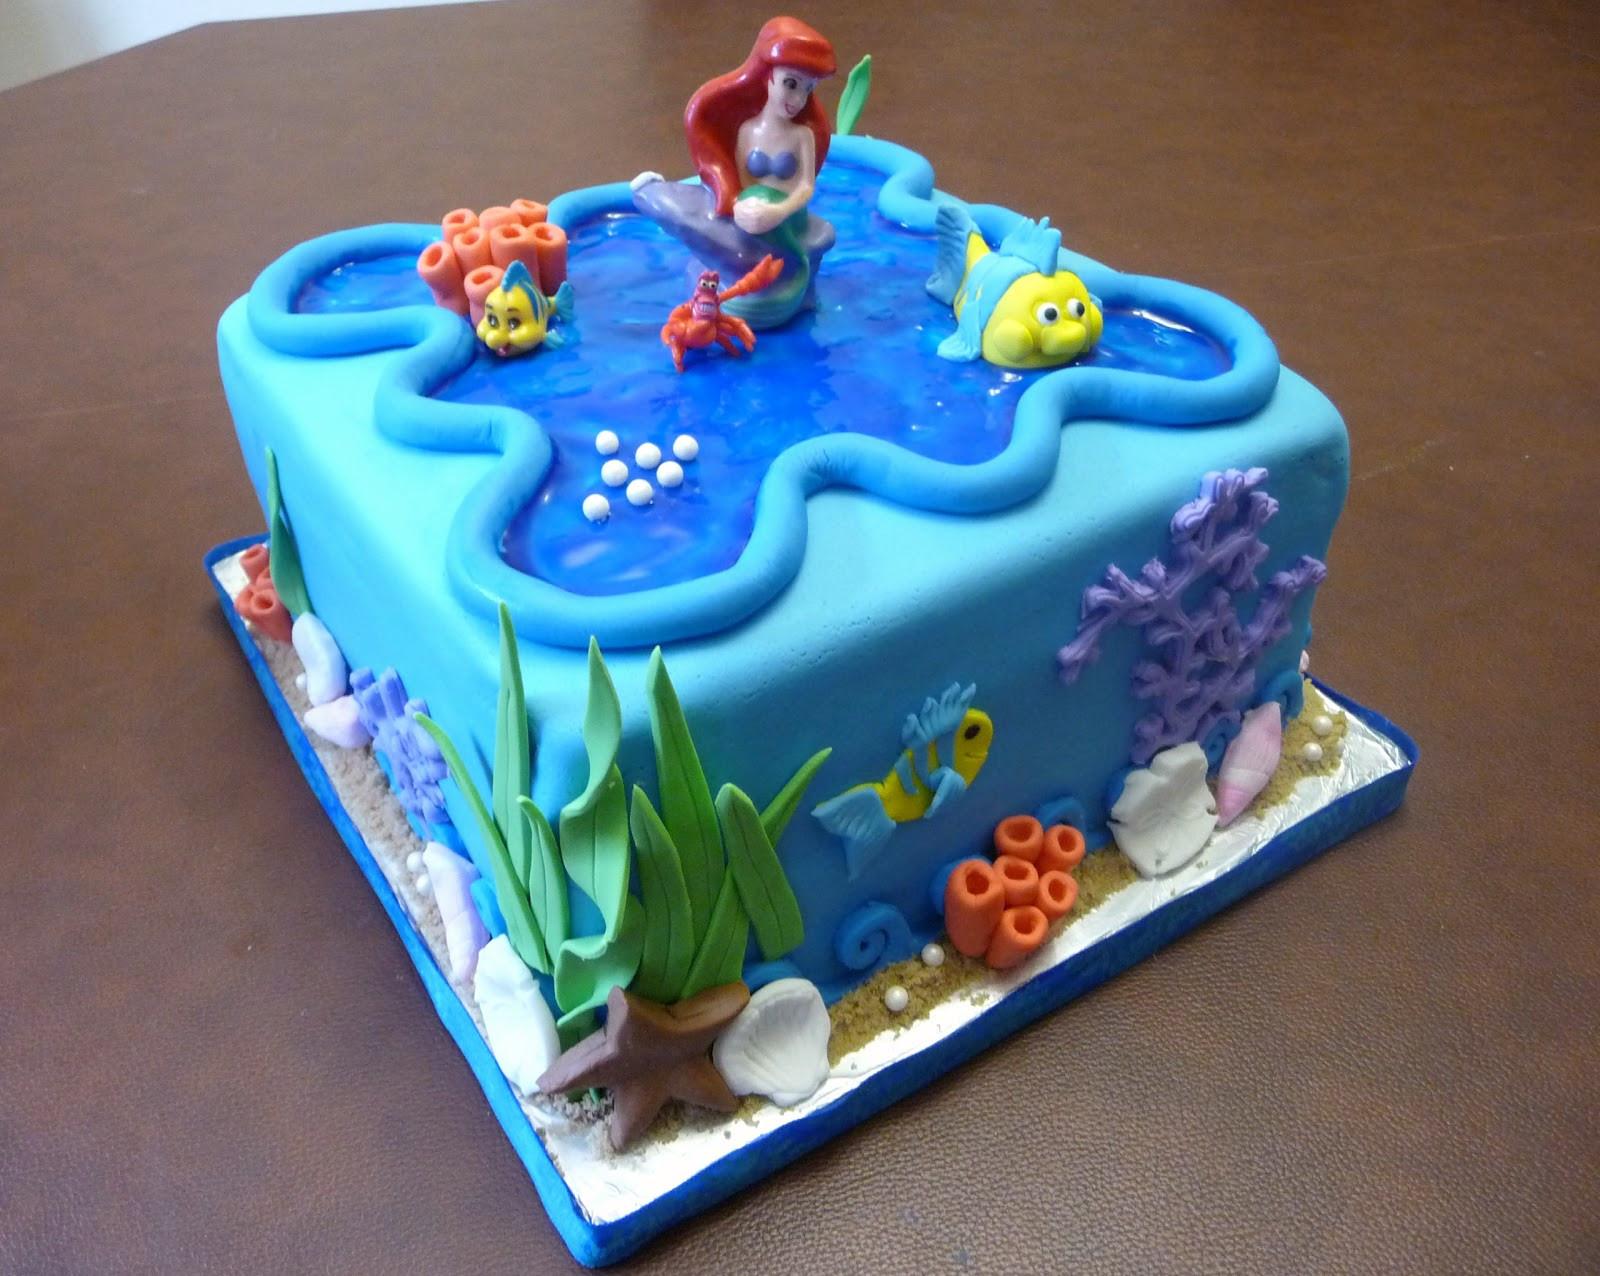 Little Mermaid Birthday Cake  Pure Delights Baking Co The Little Mermaid